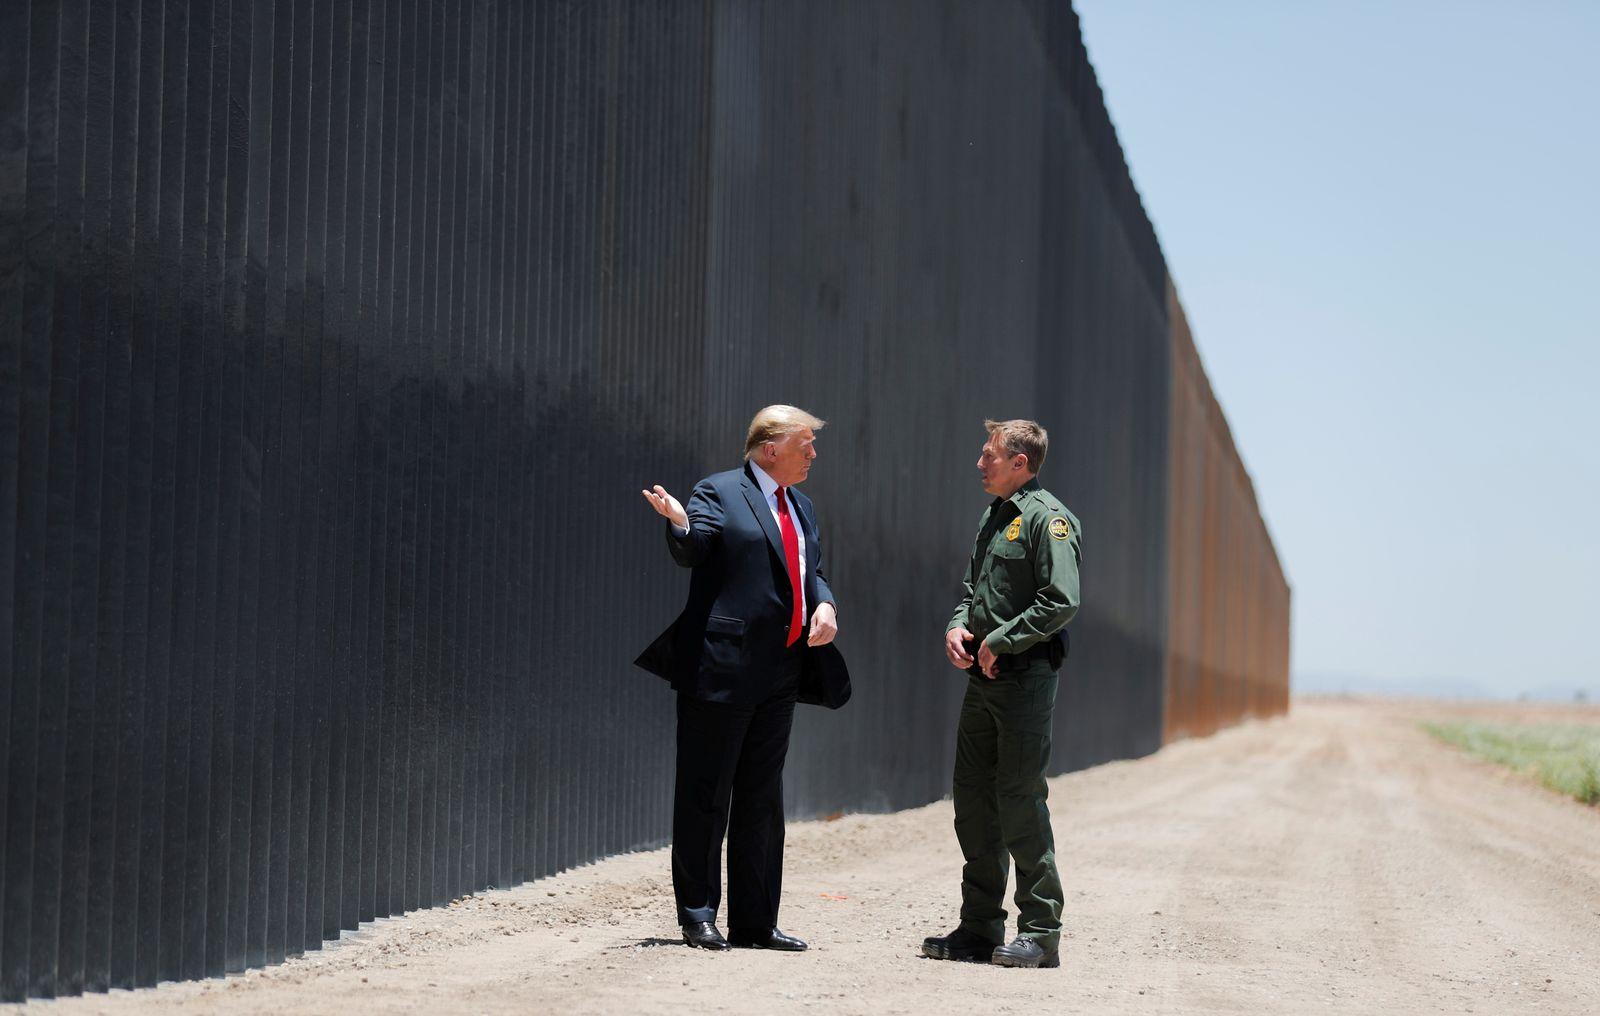 U.S. President Trump visits the U.S.-Mexico border in San Luis, Arizona